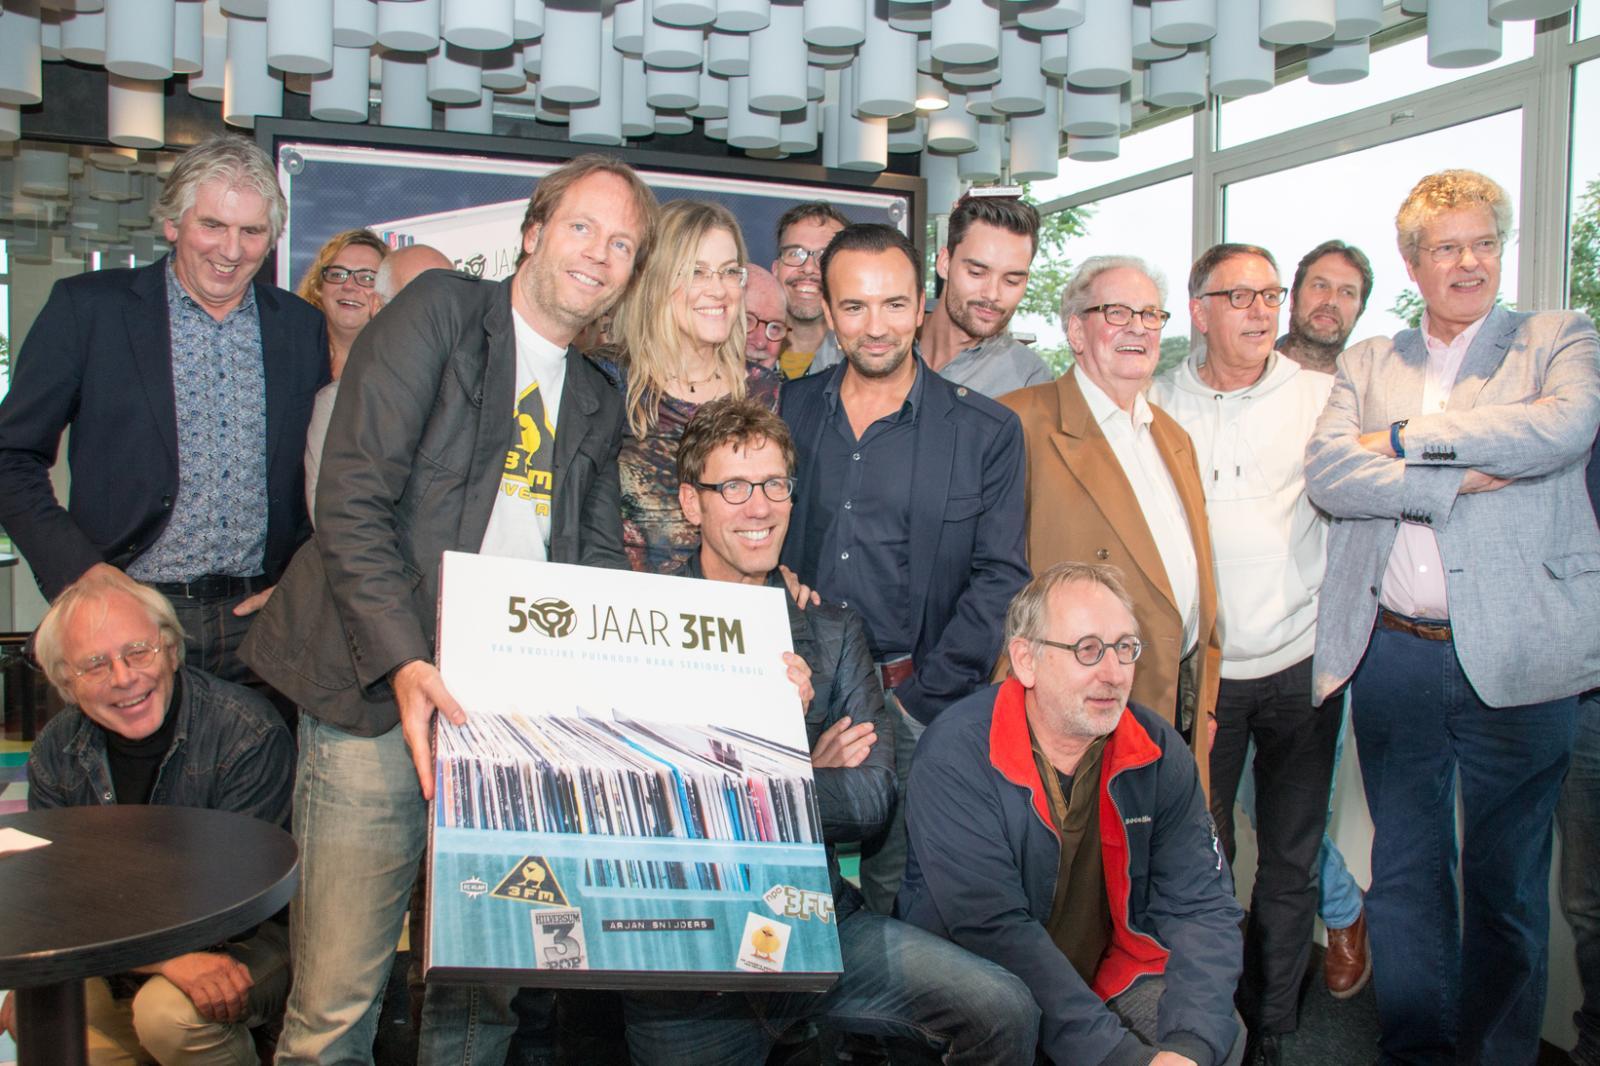 2015-09-24-Boek50Jaar3FM-0075.jpg